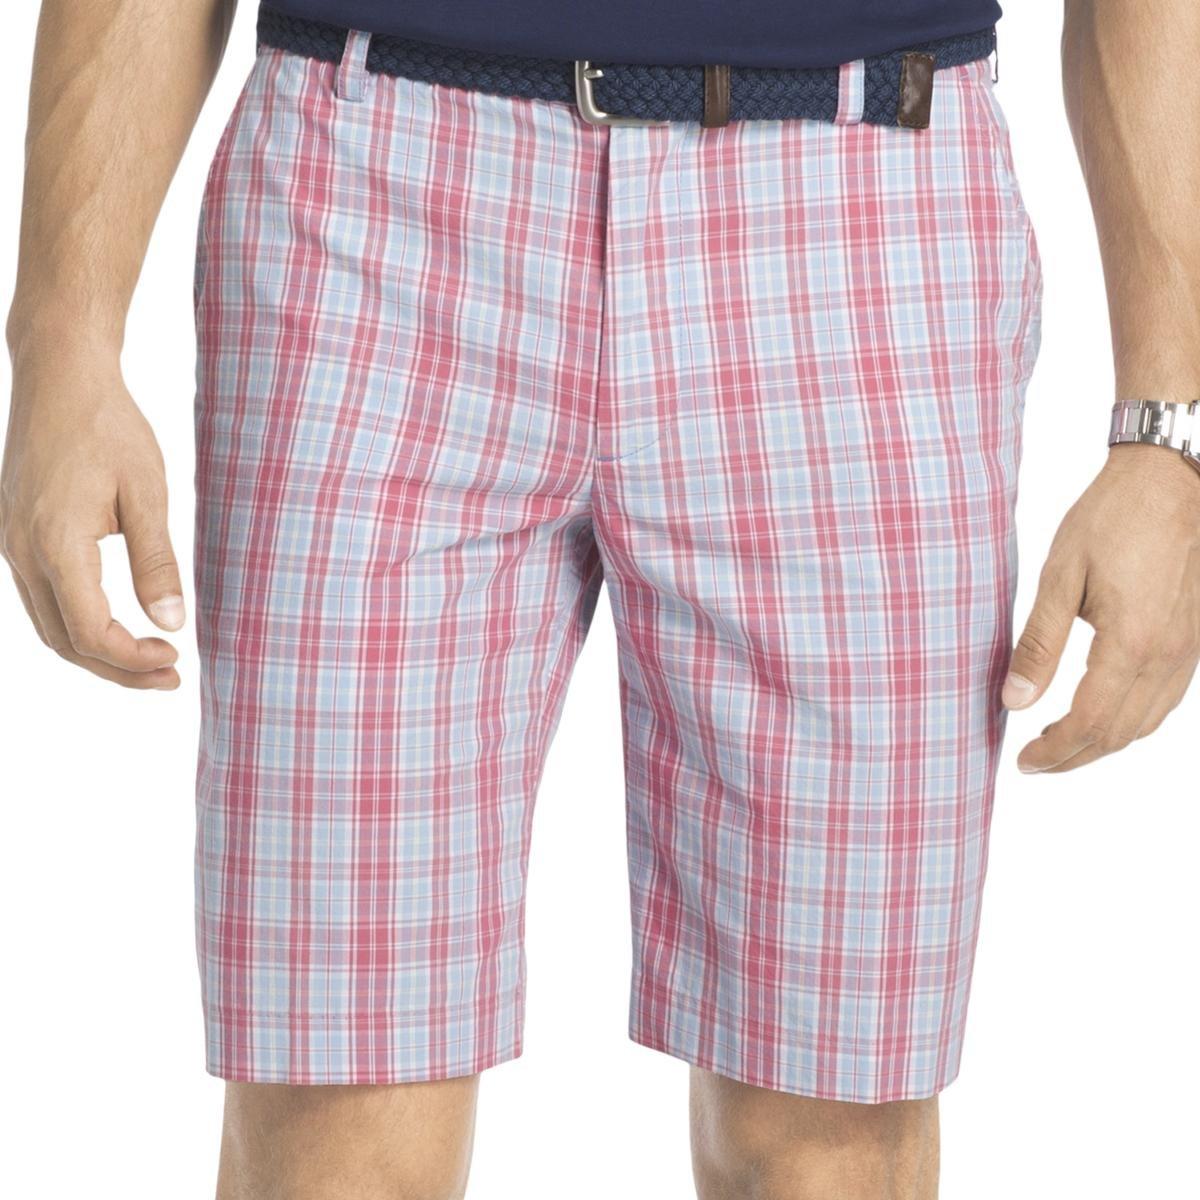 IZOD Mens Plaid Lightweight Casual Shorts Pink 30